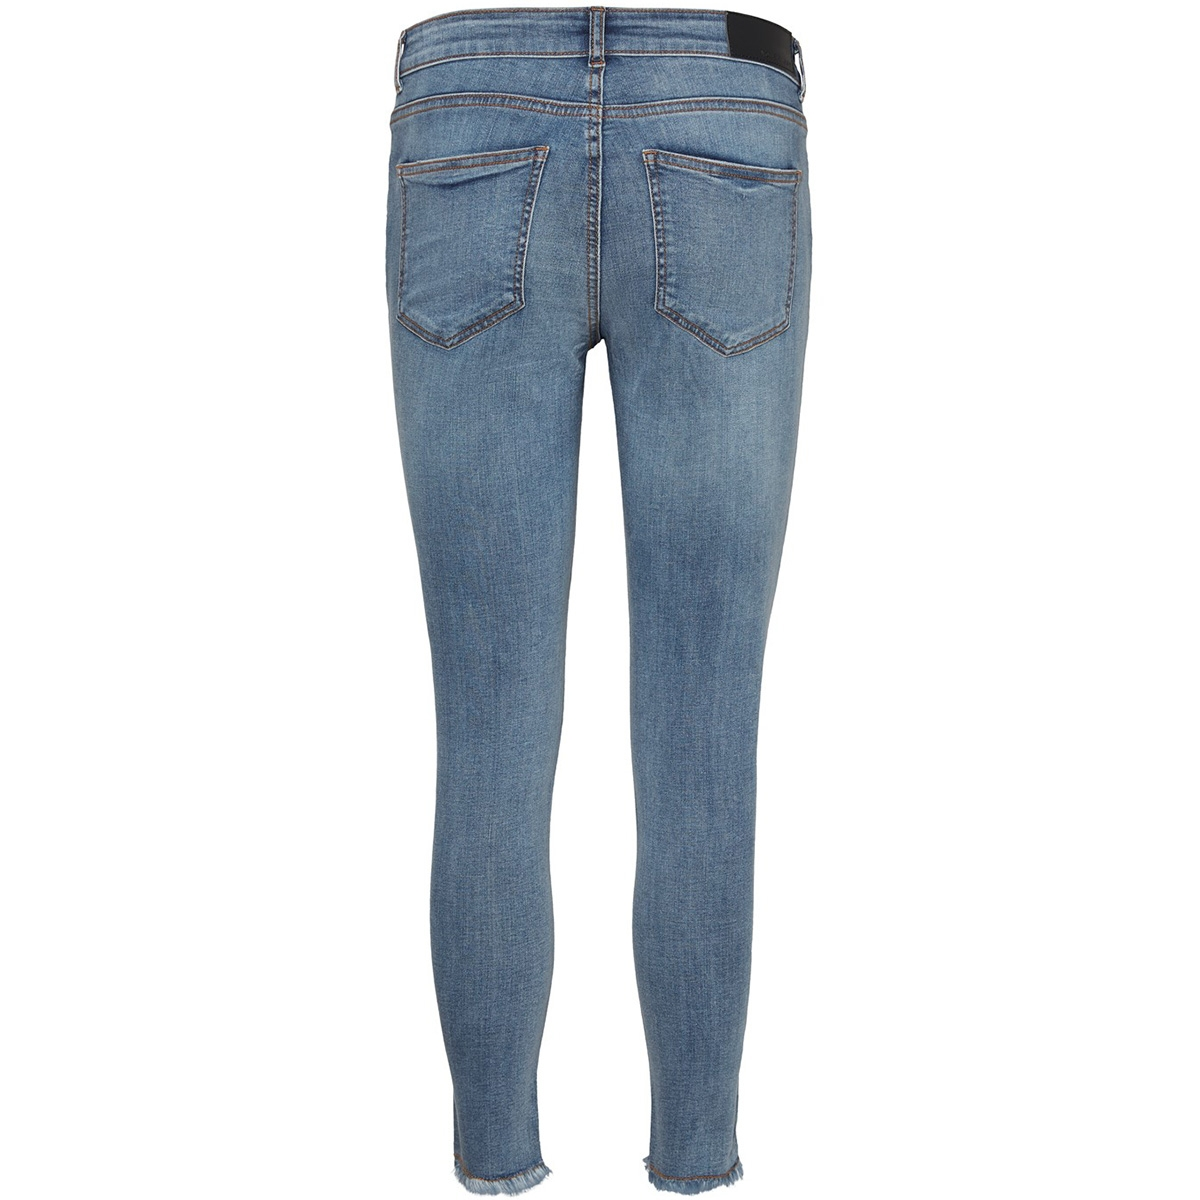 nmlucy nw skinny ank jeans az084lb 27009512 noisy may jeans light blue denim